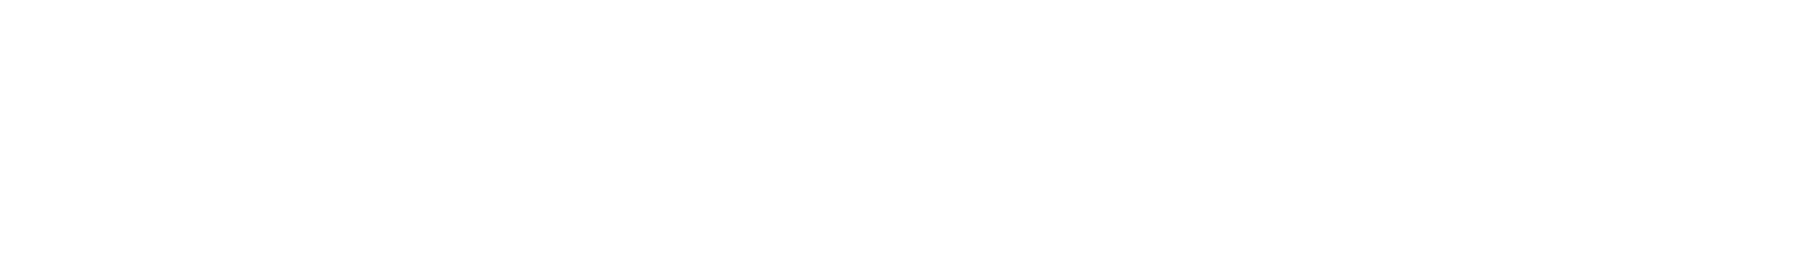 blbc jazzydrums 75 04